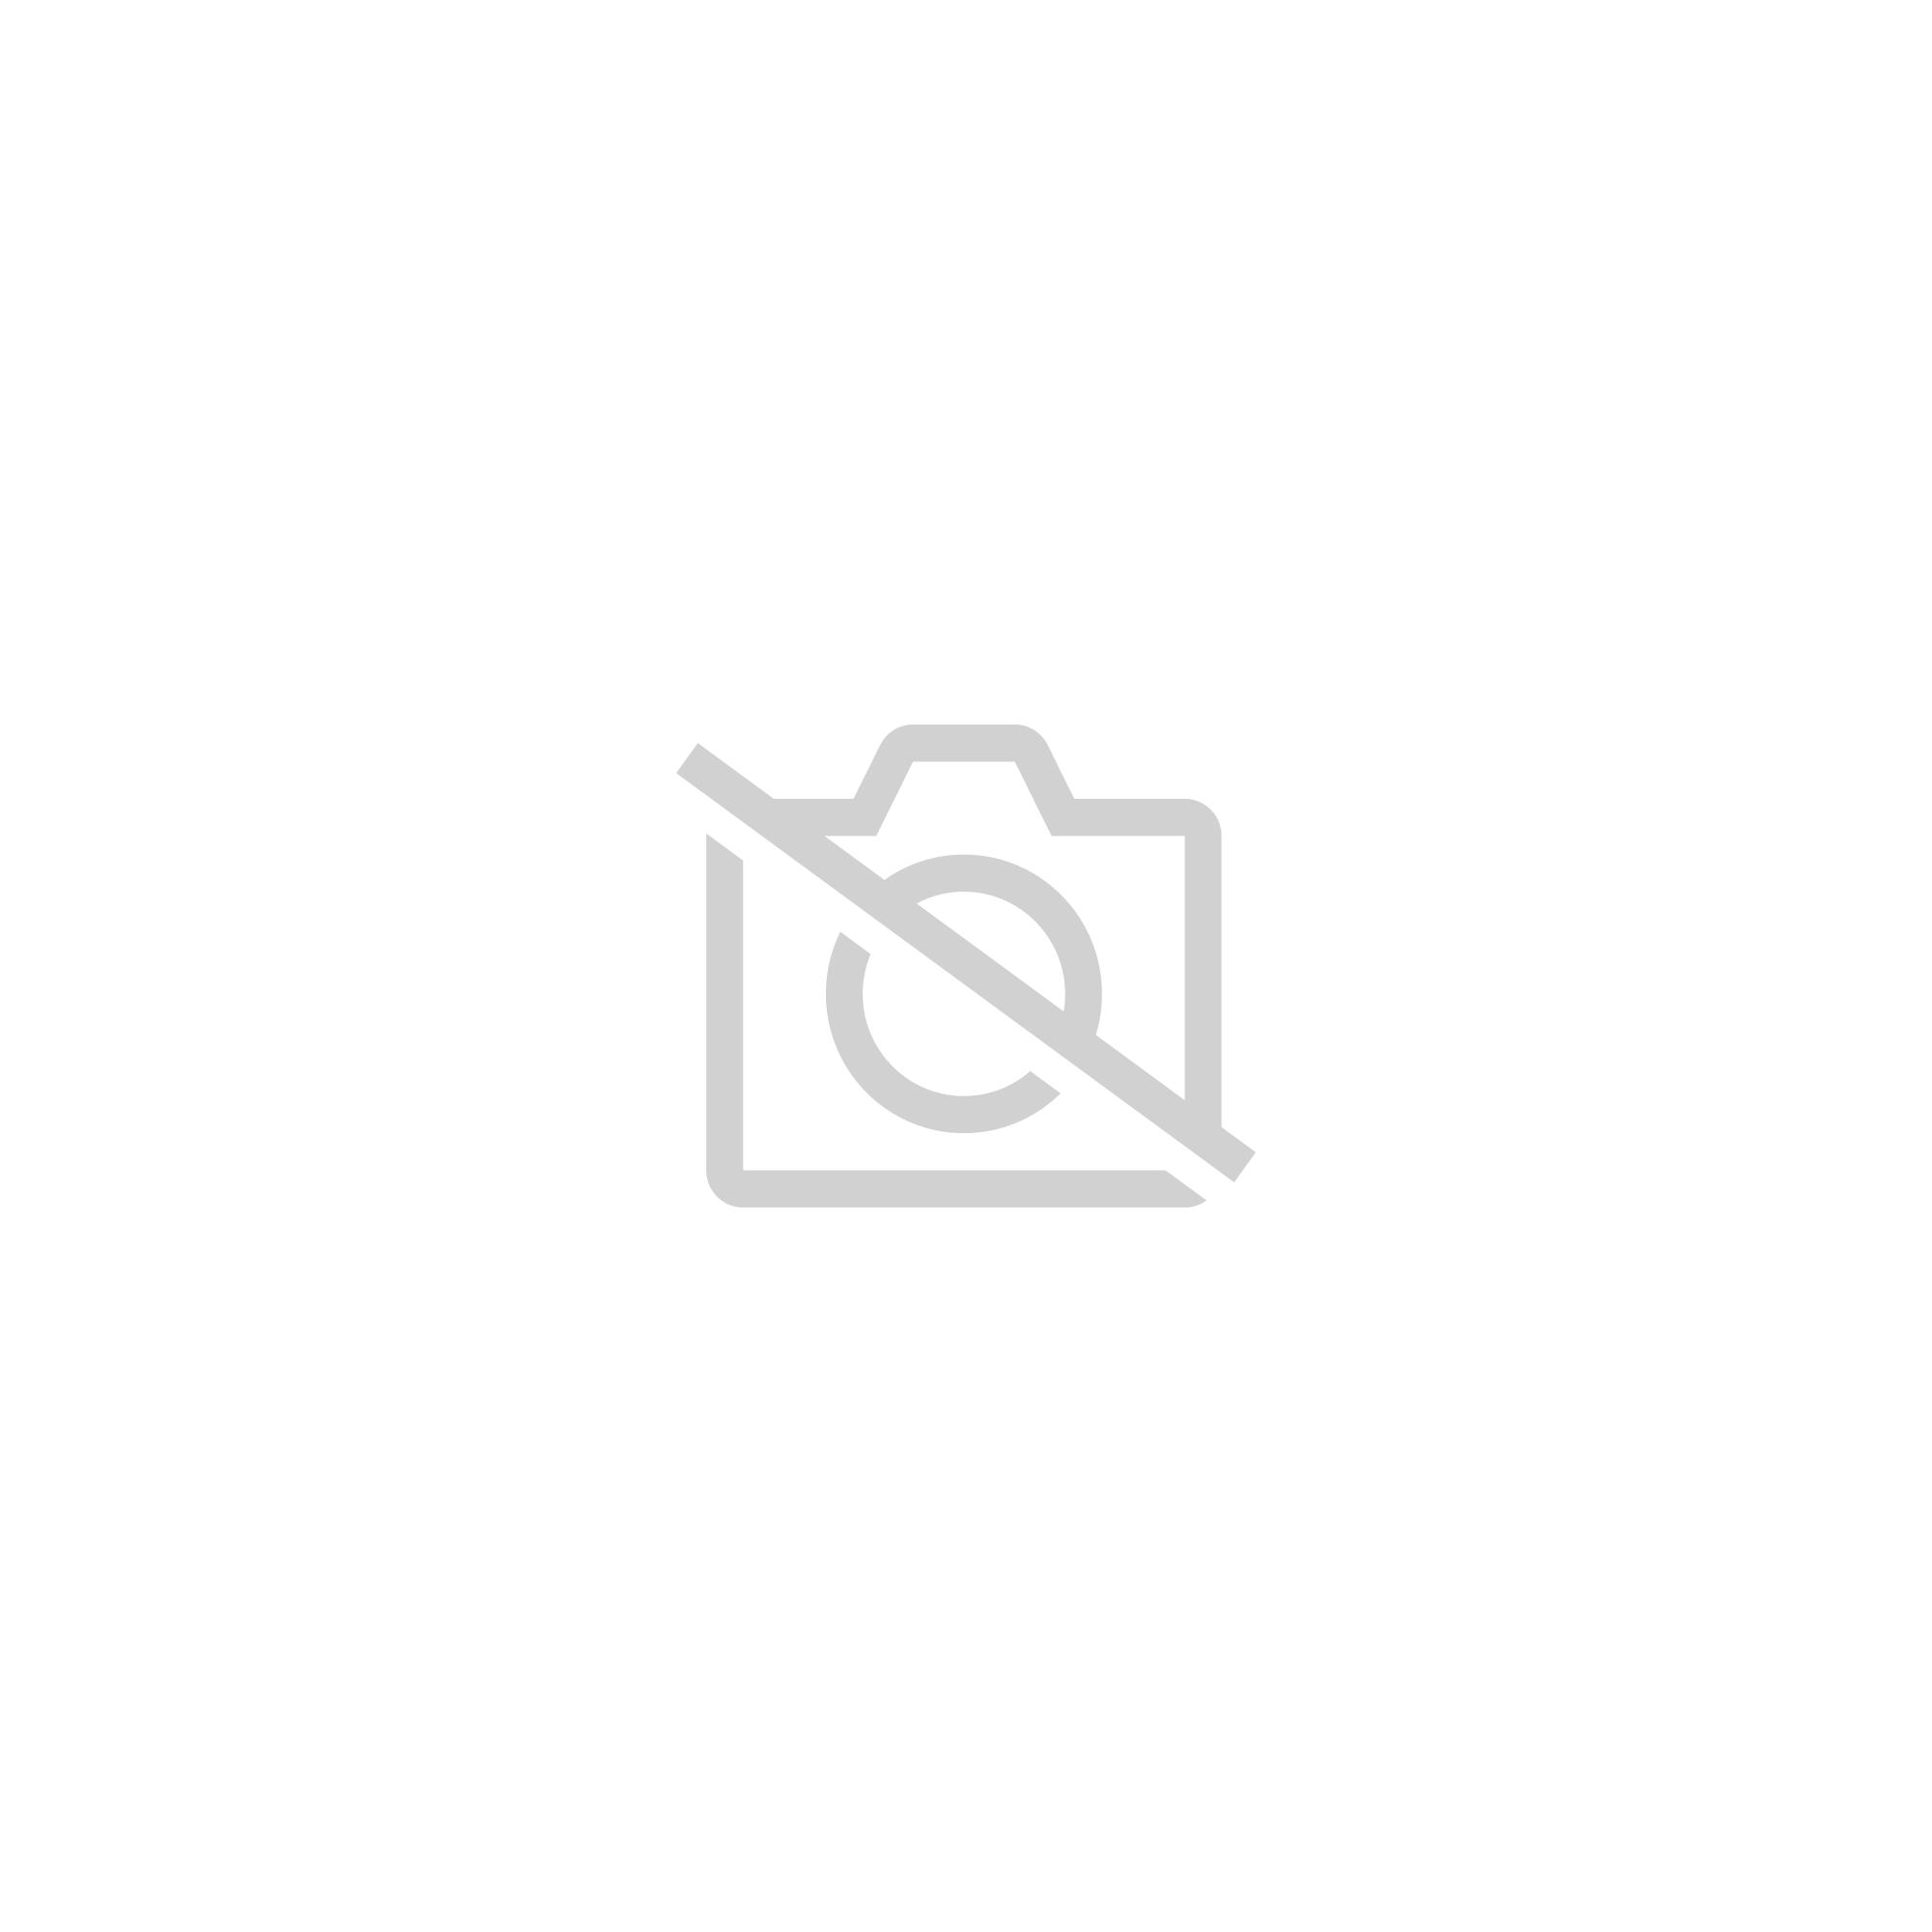 Naruto Shippuden - Statuette Madara Uchiwa - Dx-Tra Collection �dition Limit�e